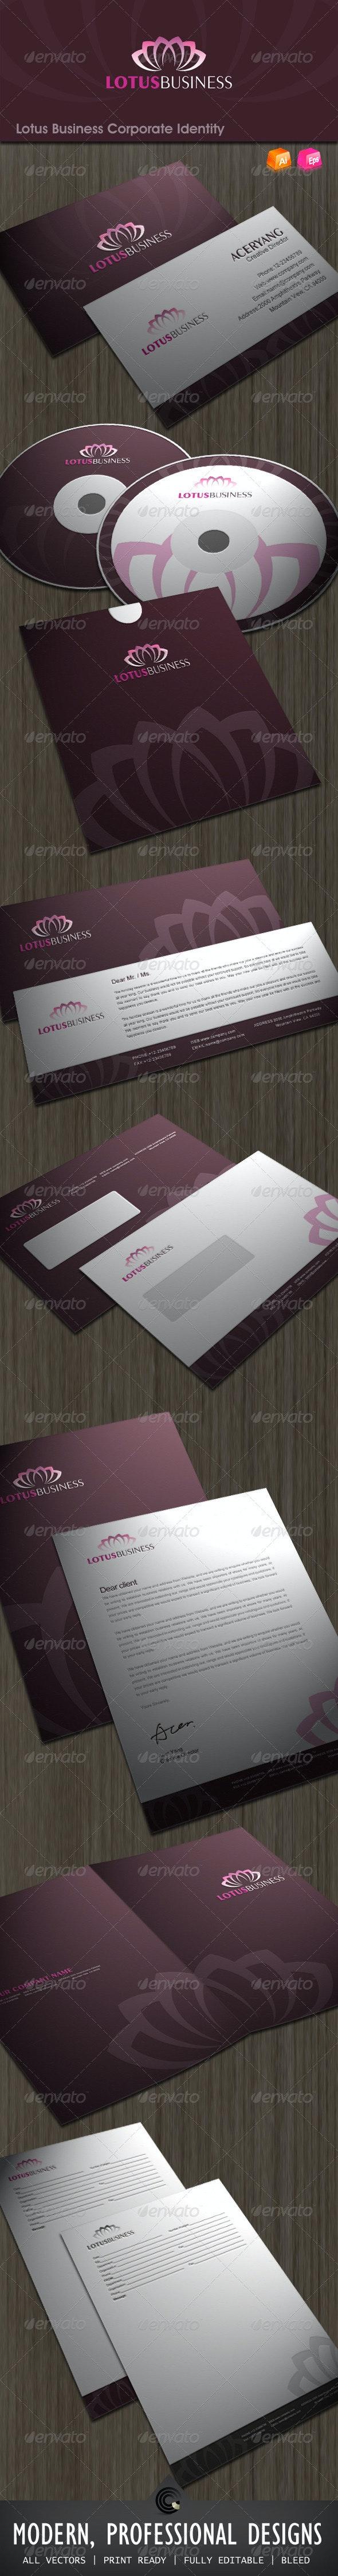 Lotus Business Corporate Identity - Stationery Print Templates